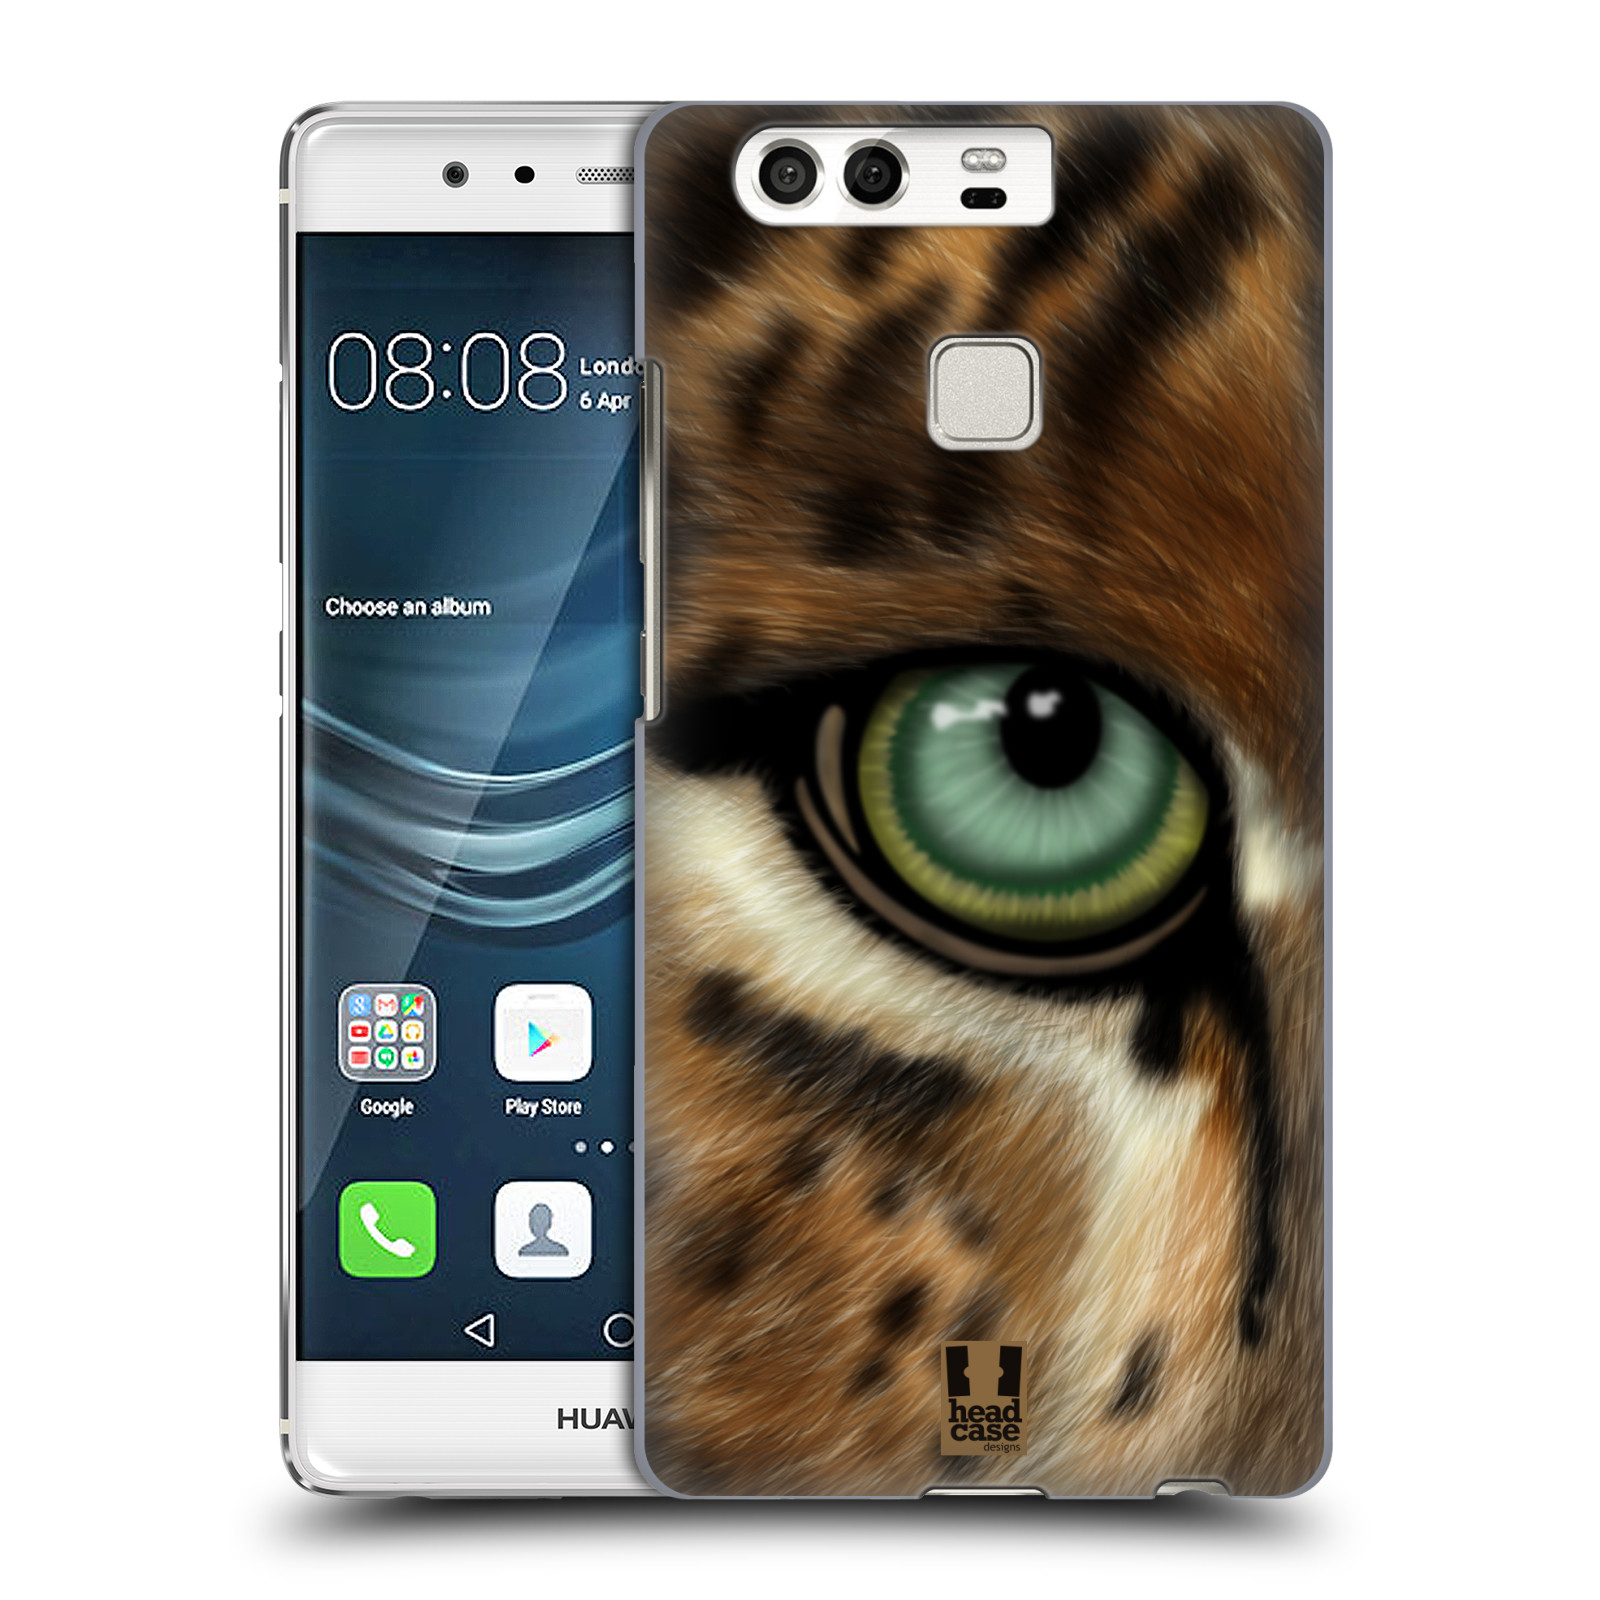 HEAD CASE plastový obal na mobil Huawei P9 / P9 DUAL SIM vzor pohled zvířete oko leopard